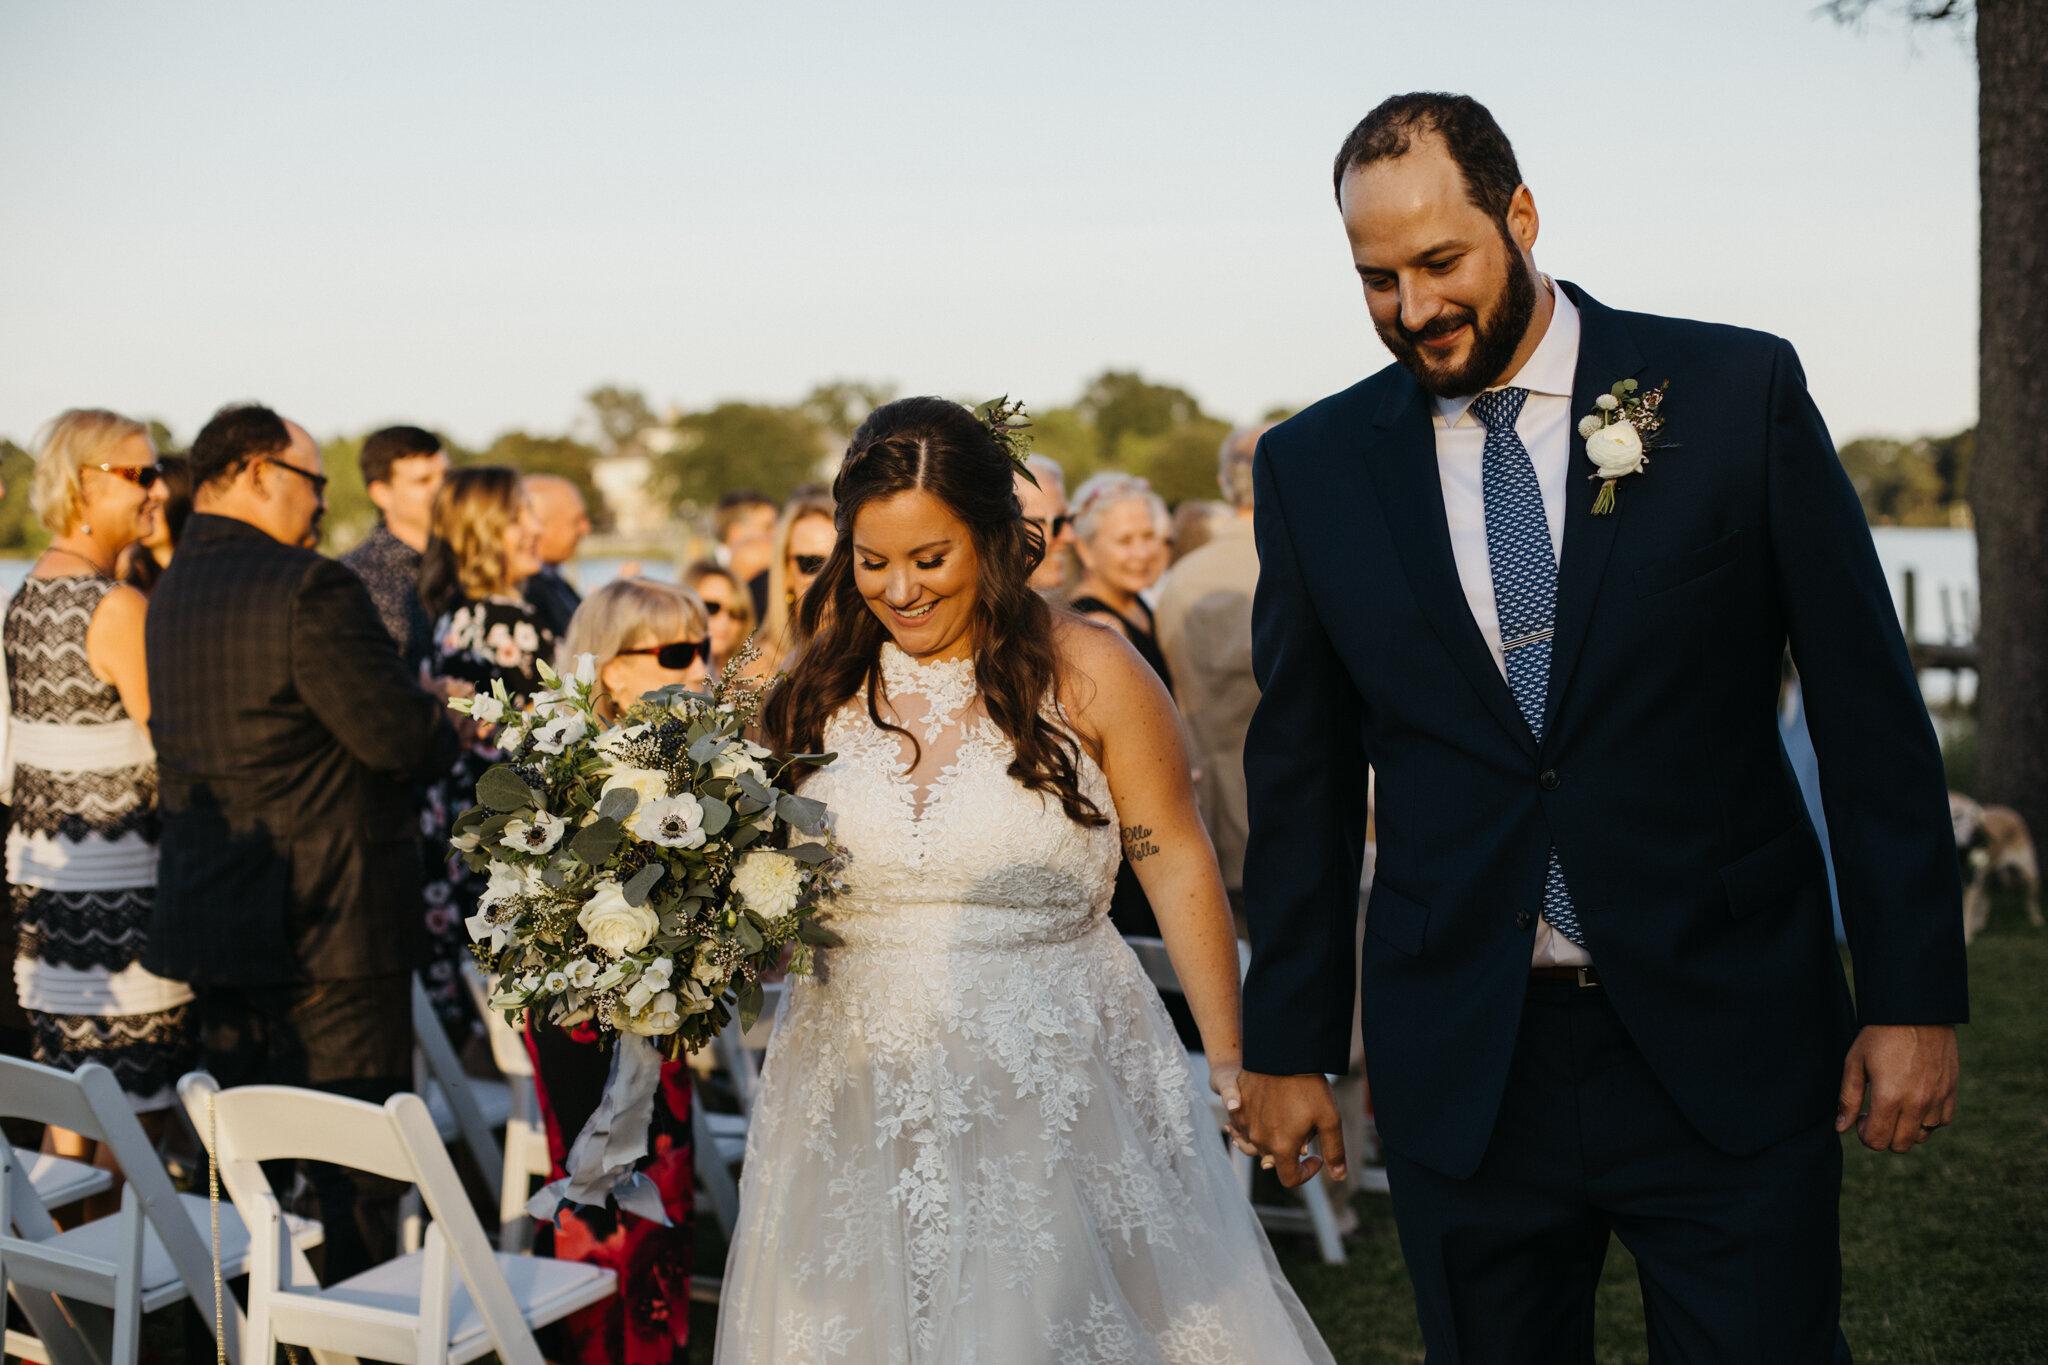 angela_jason_norfolk_wedding-110.jpg